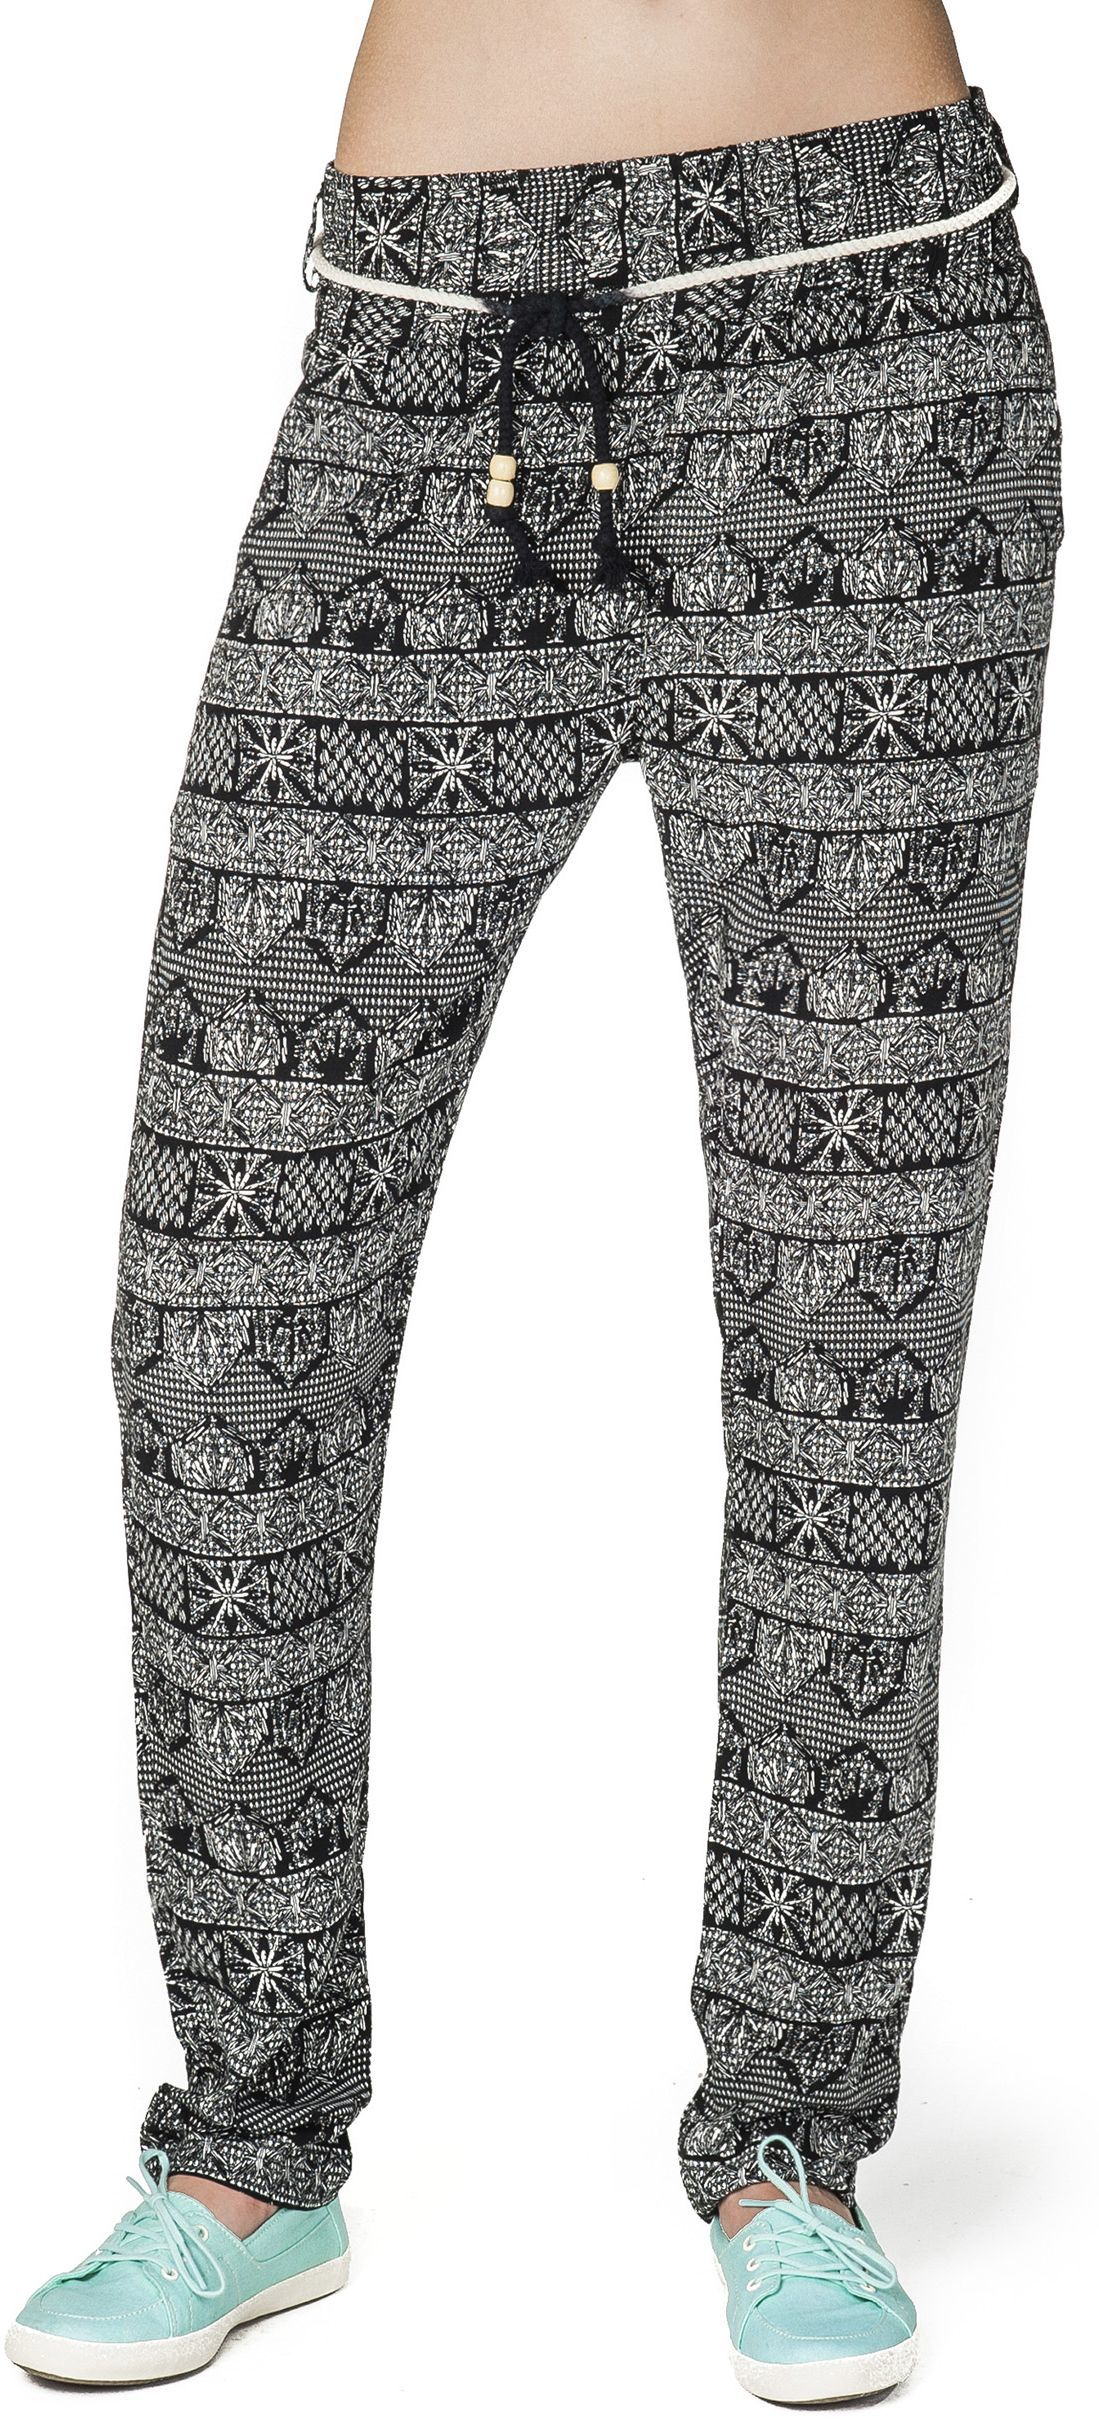 spodnie damskie HORSEFEATHERS SUPER SUMMER PANTS (black)